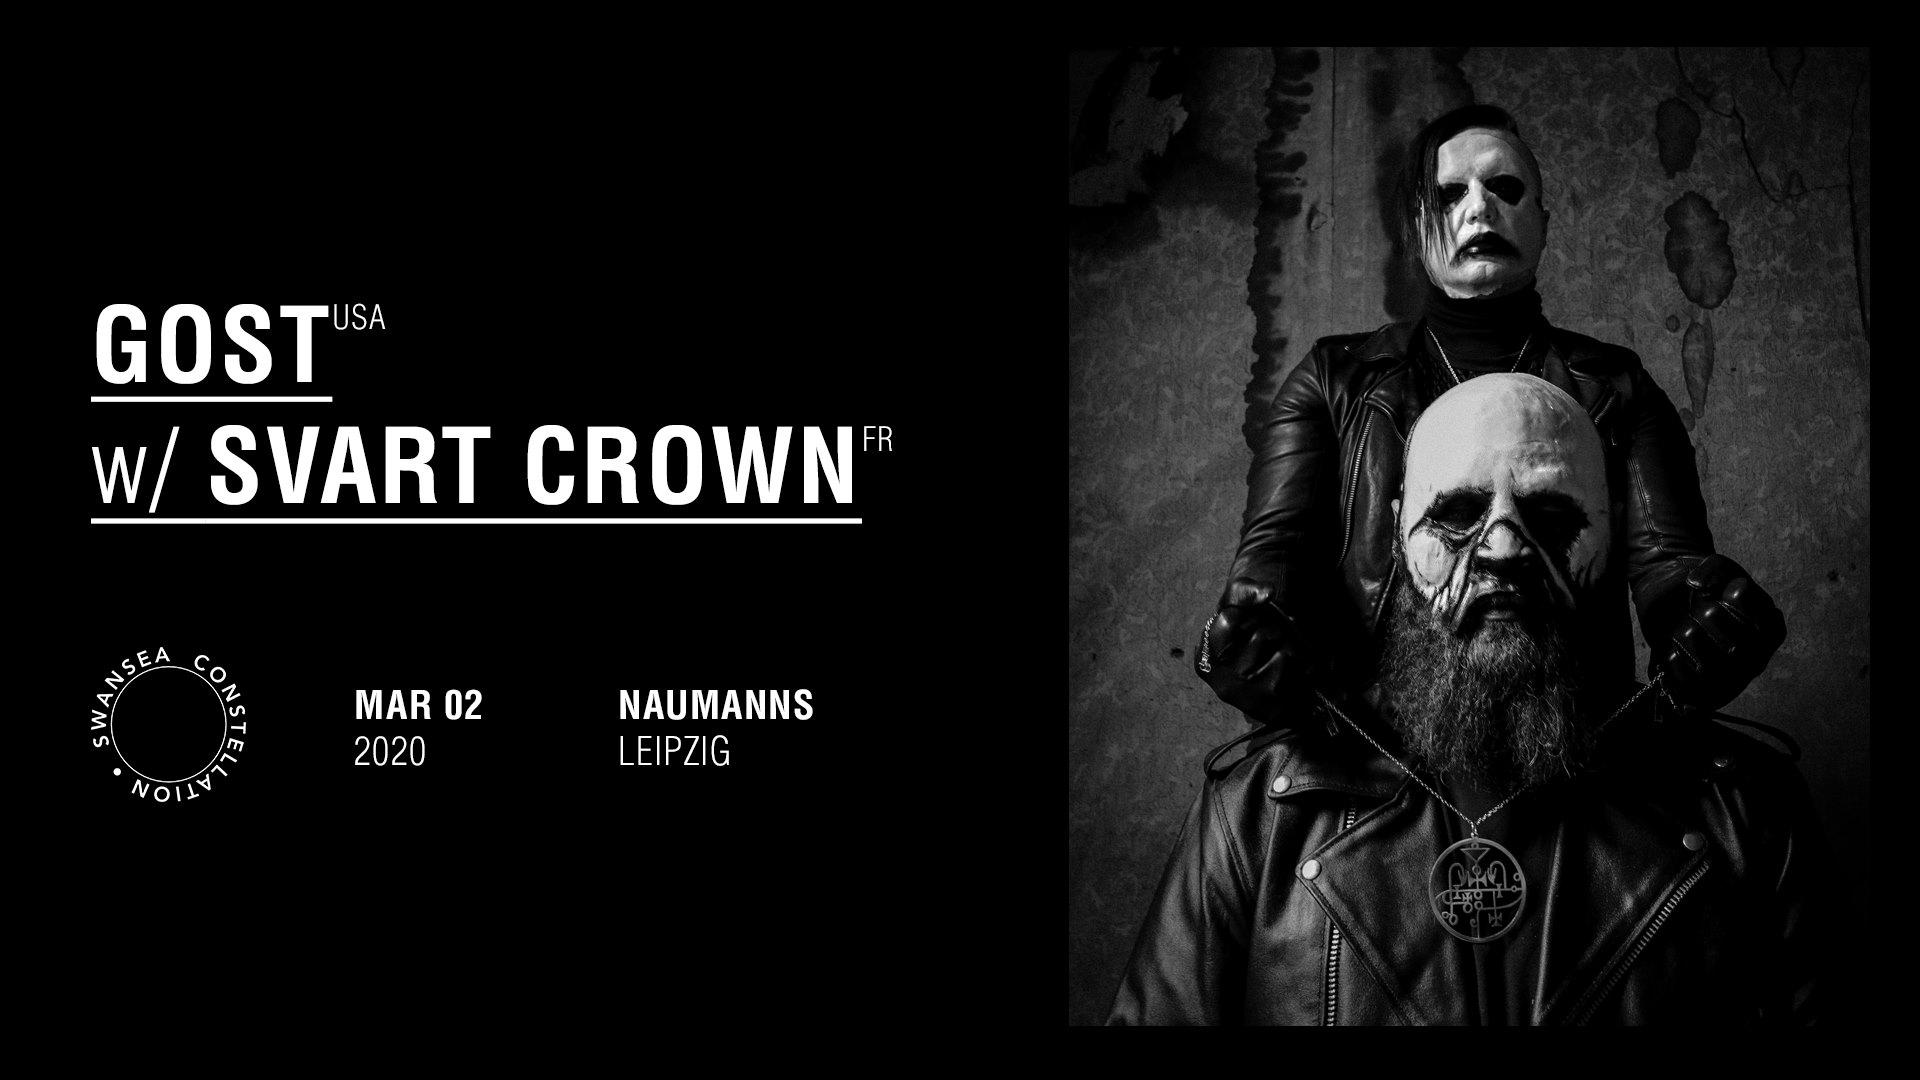 Gost w/ Svart Crown